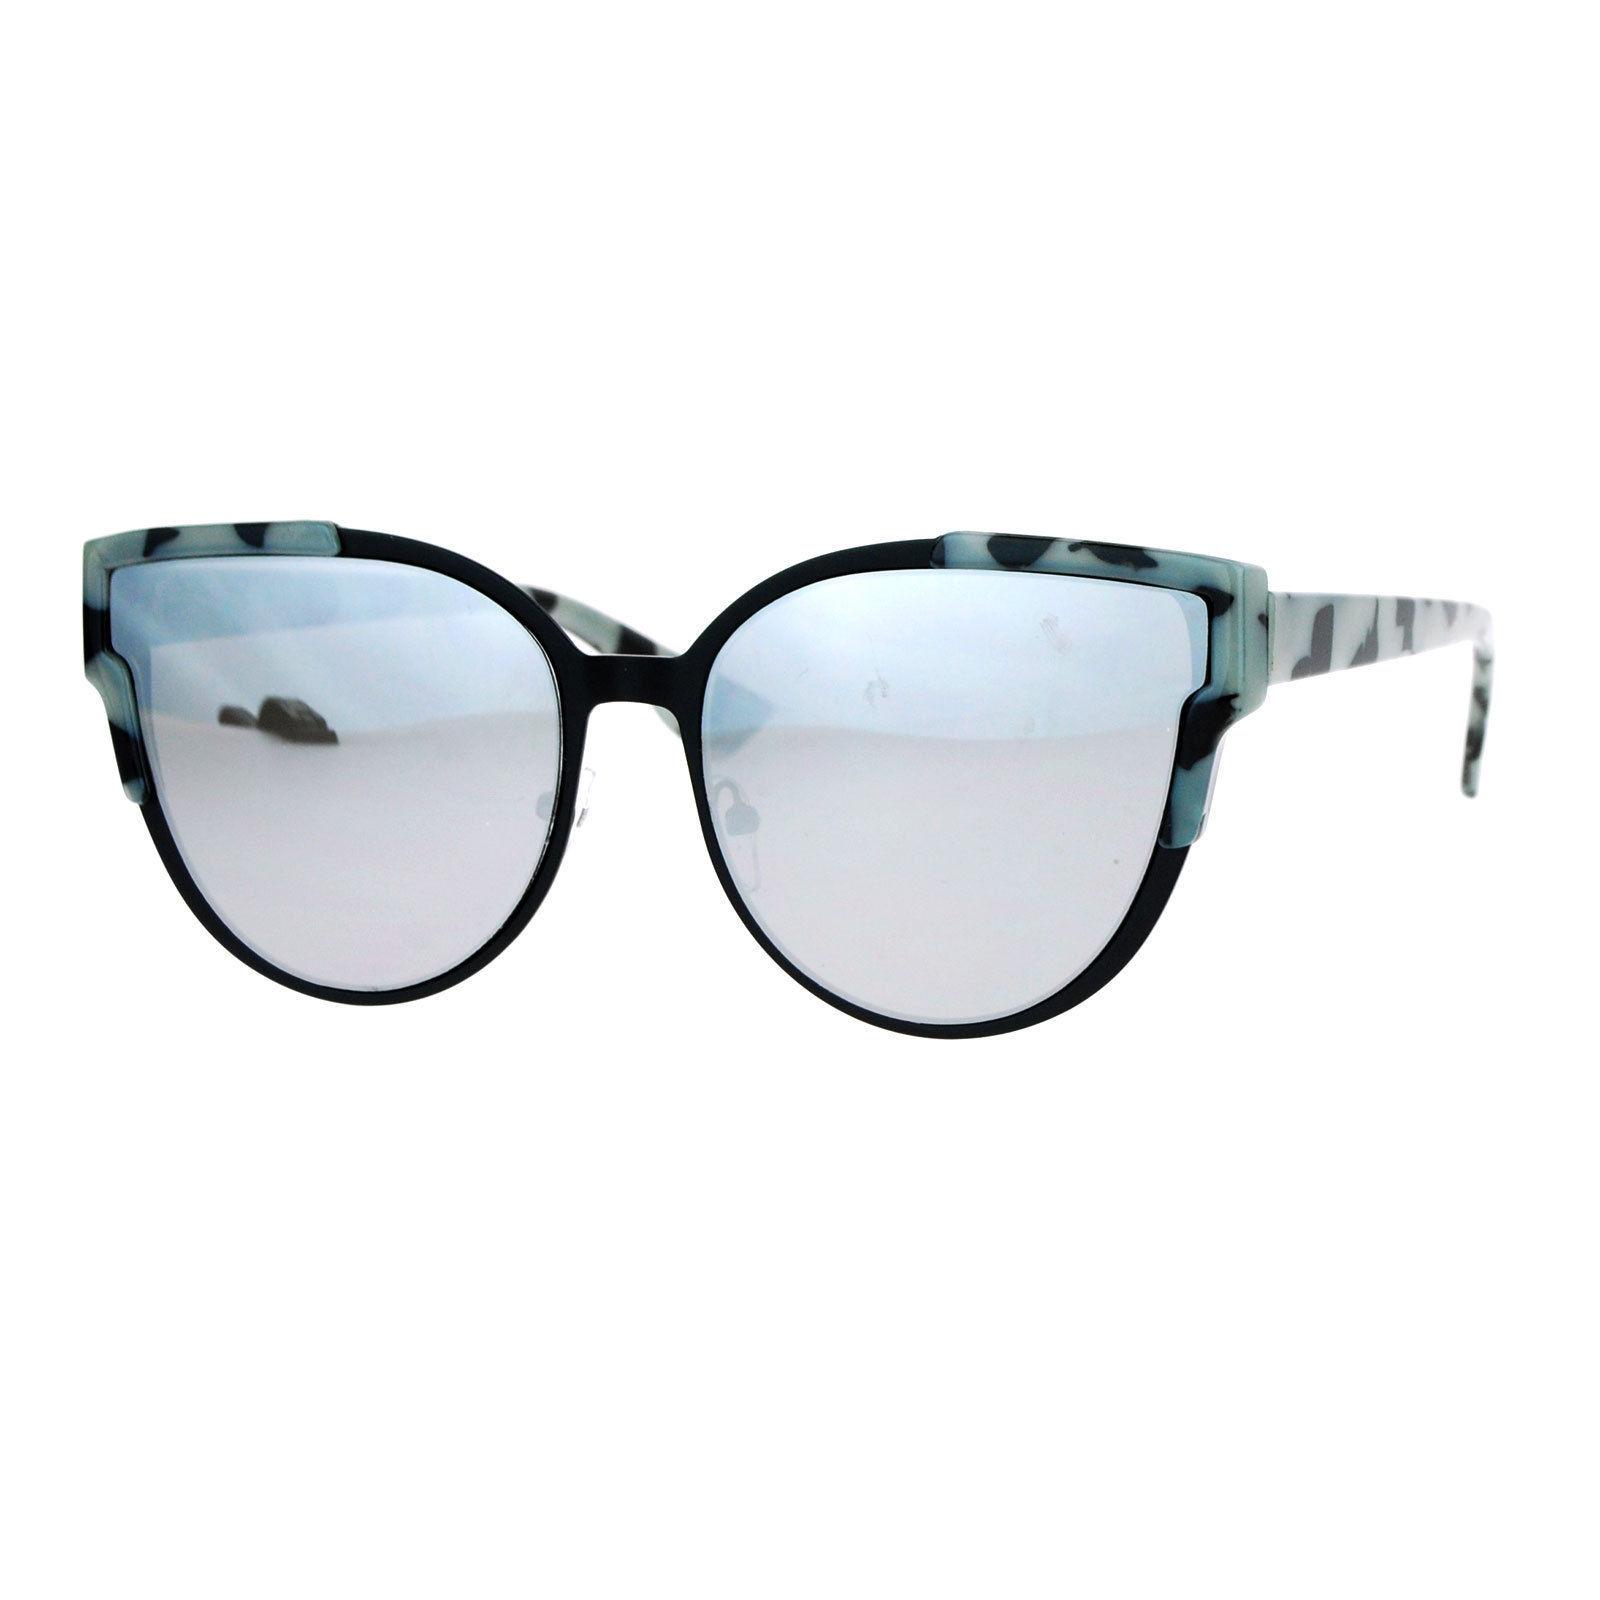 Womens Designer Fashion Sunglasses Butterfly Cateye Frame Mirror Lens UV400